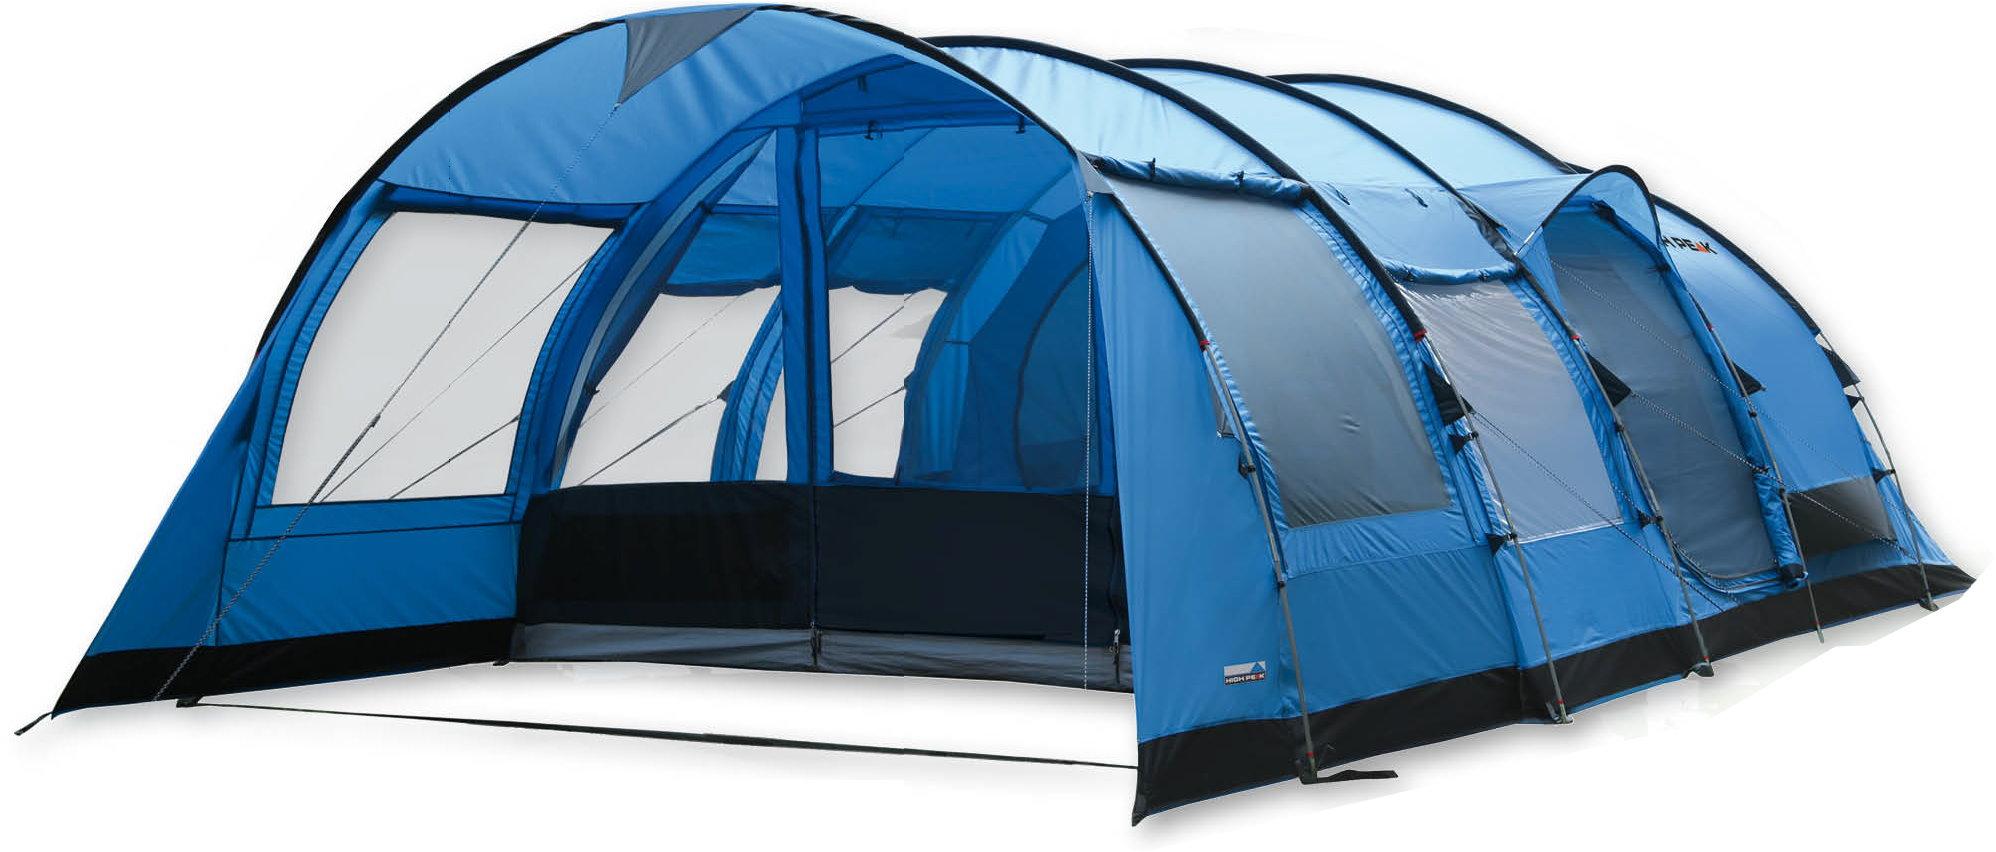 High Peak Moremi 6 6 Personen Zelt Wassersäule 4000 Mm Sport Breiden